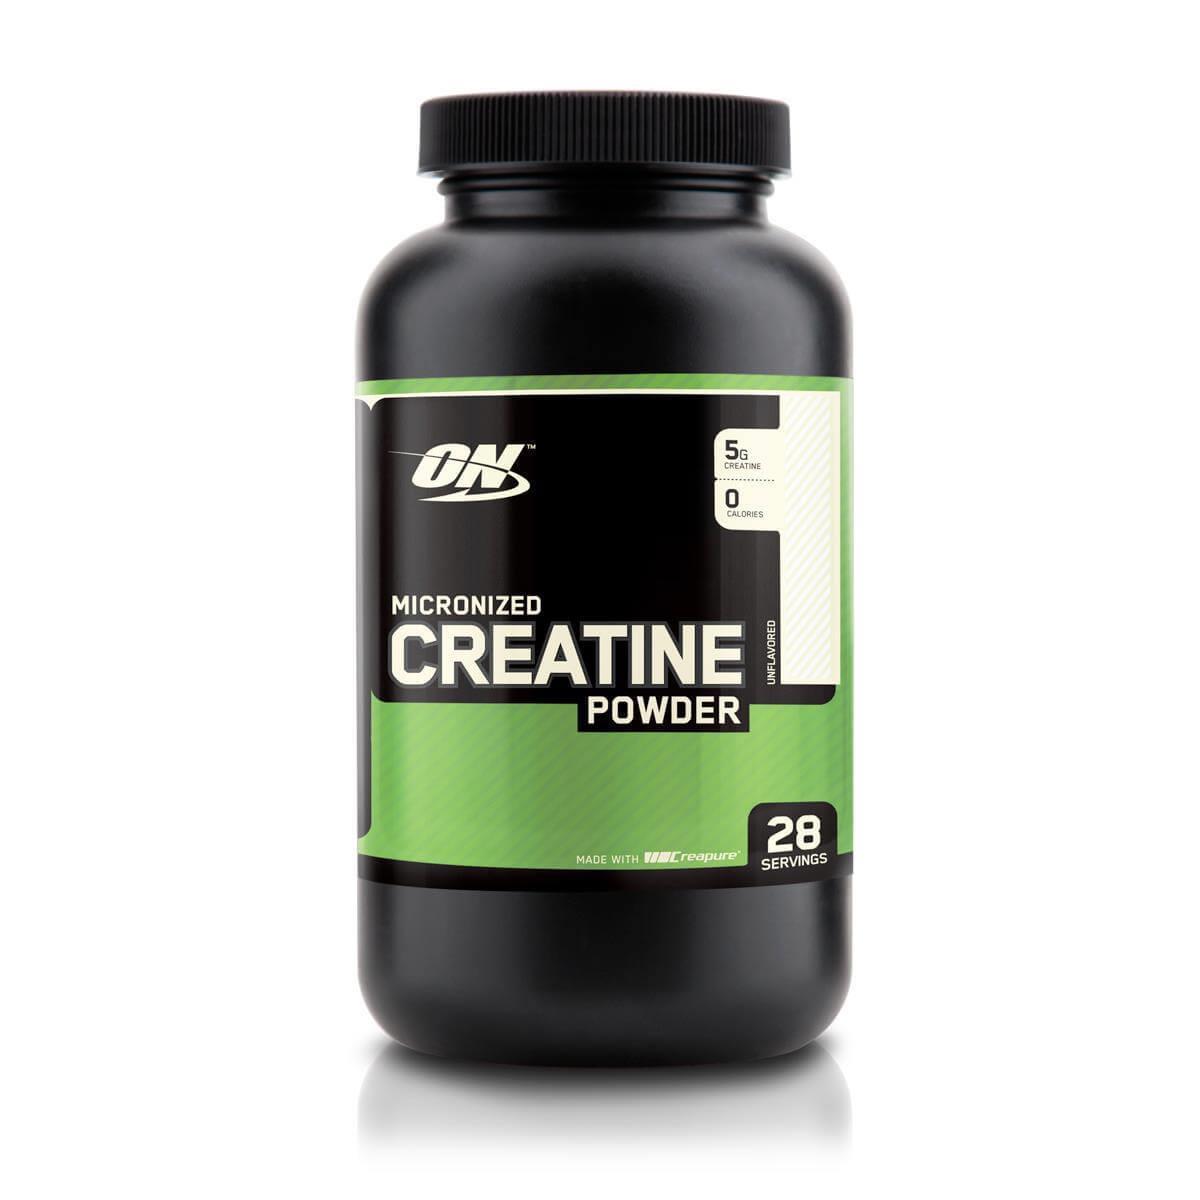 fa30a9d53 CREATINA CREAPURE EM PÓ - Optimum Nutrition